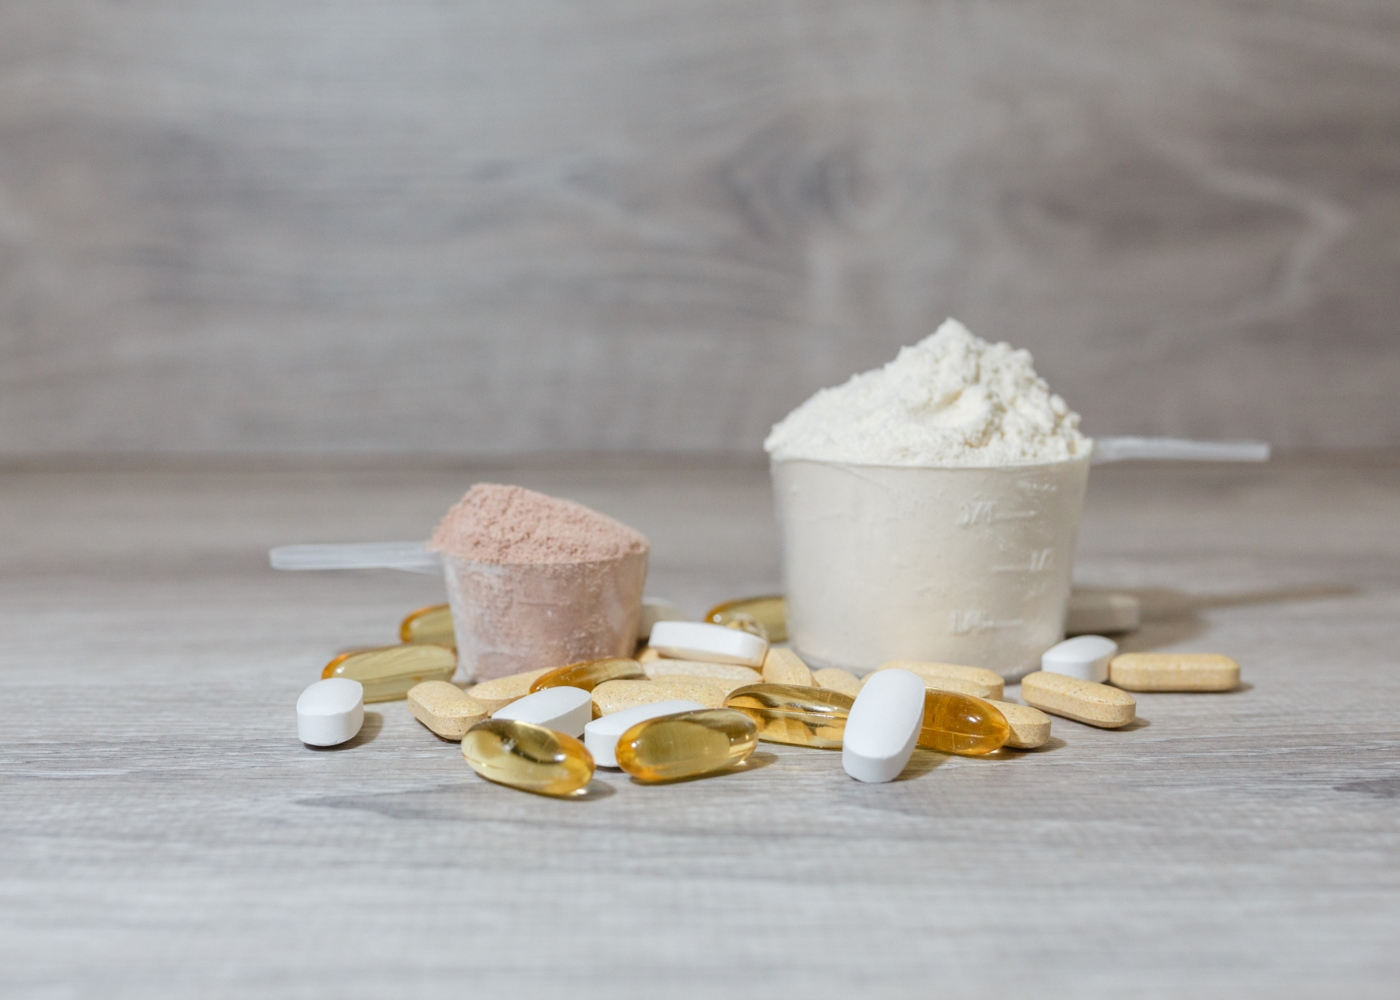 Suplementos vitamínicos no desporto: vitaminas e minerais